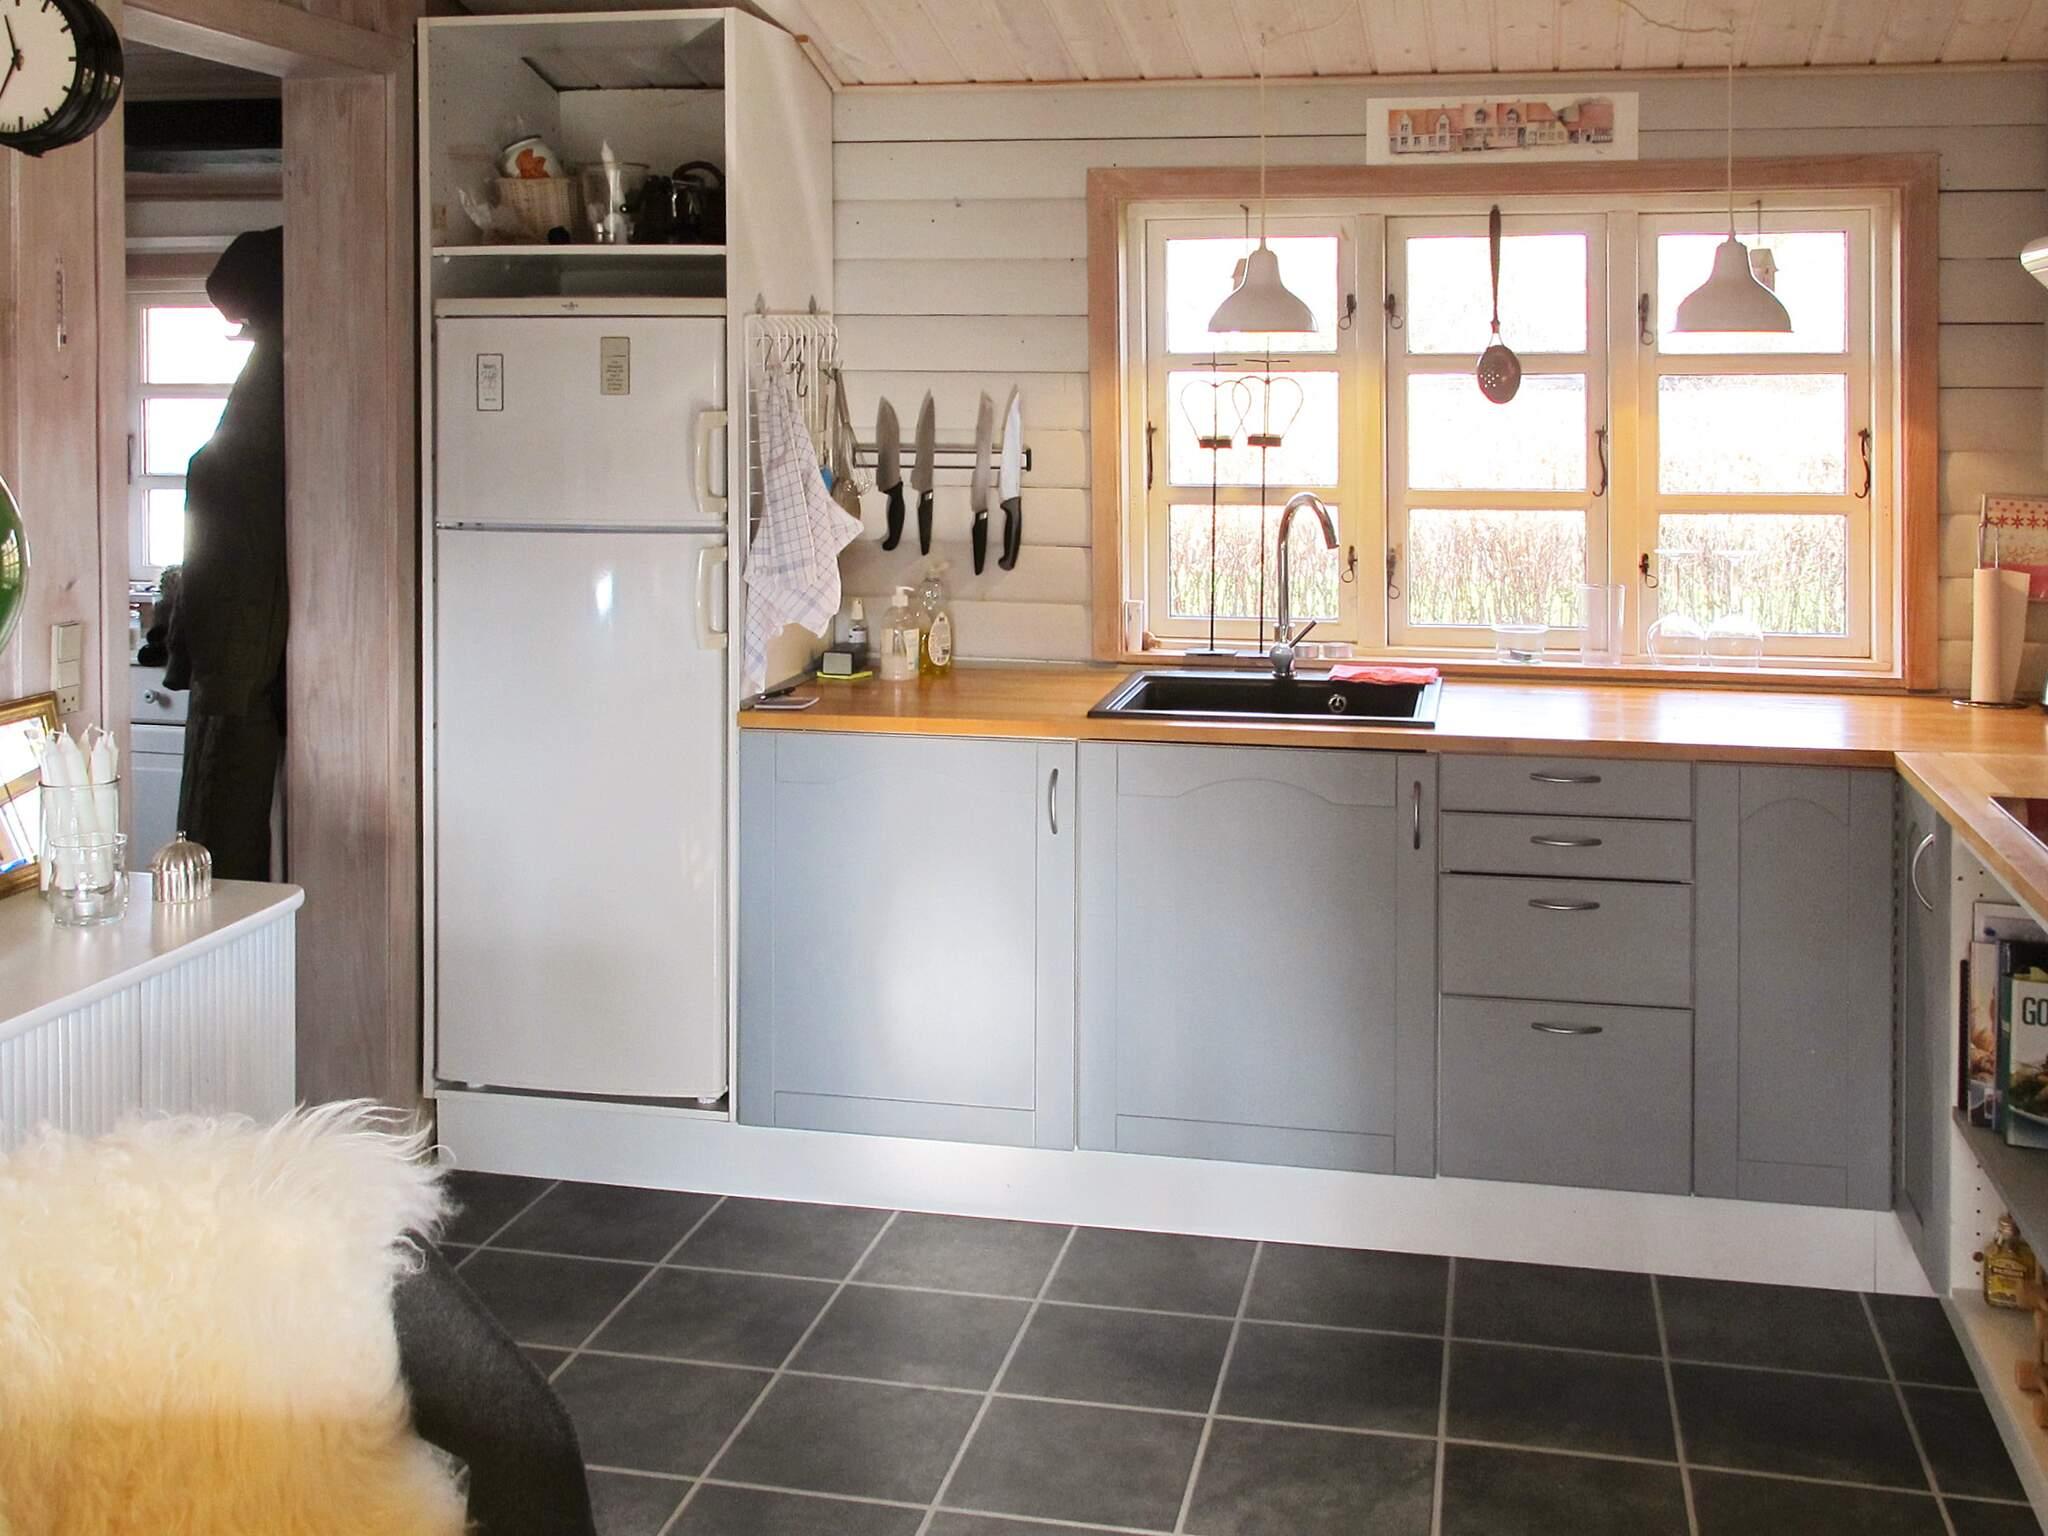 Ferienhaus Ore Strand (2561593), Oreby, , Südseeland, Dänemark, Bild 7